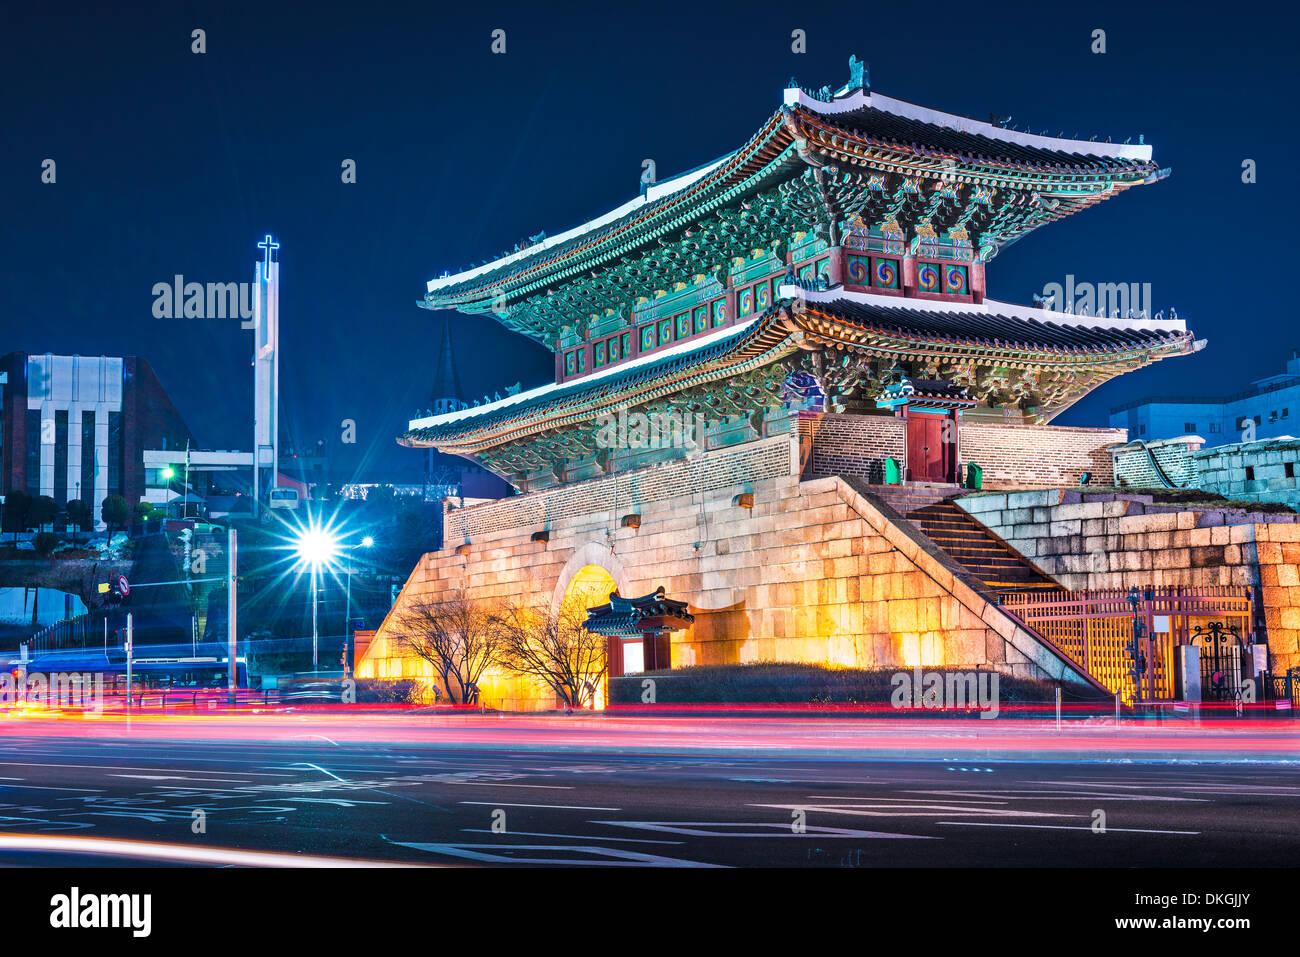 Seoul, South Korea at Namdaemun Gate. - Stock Image